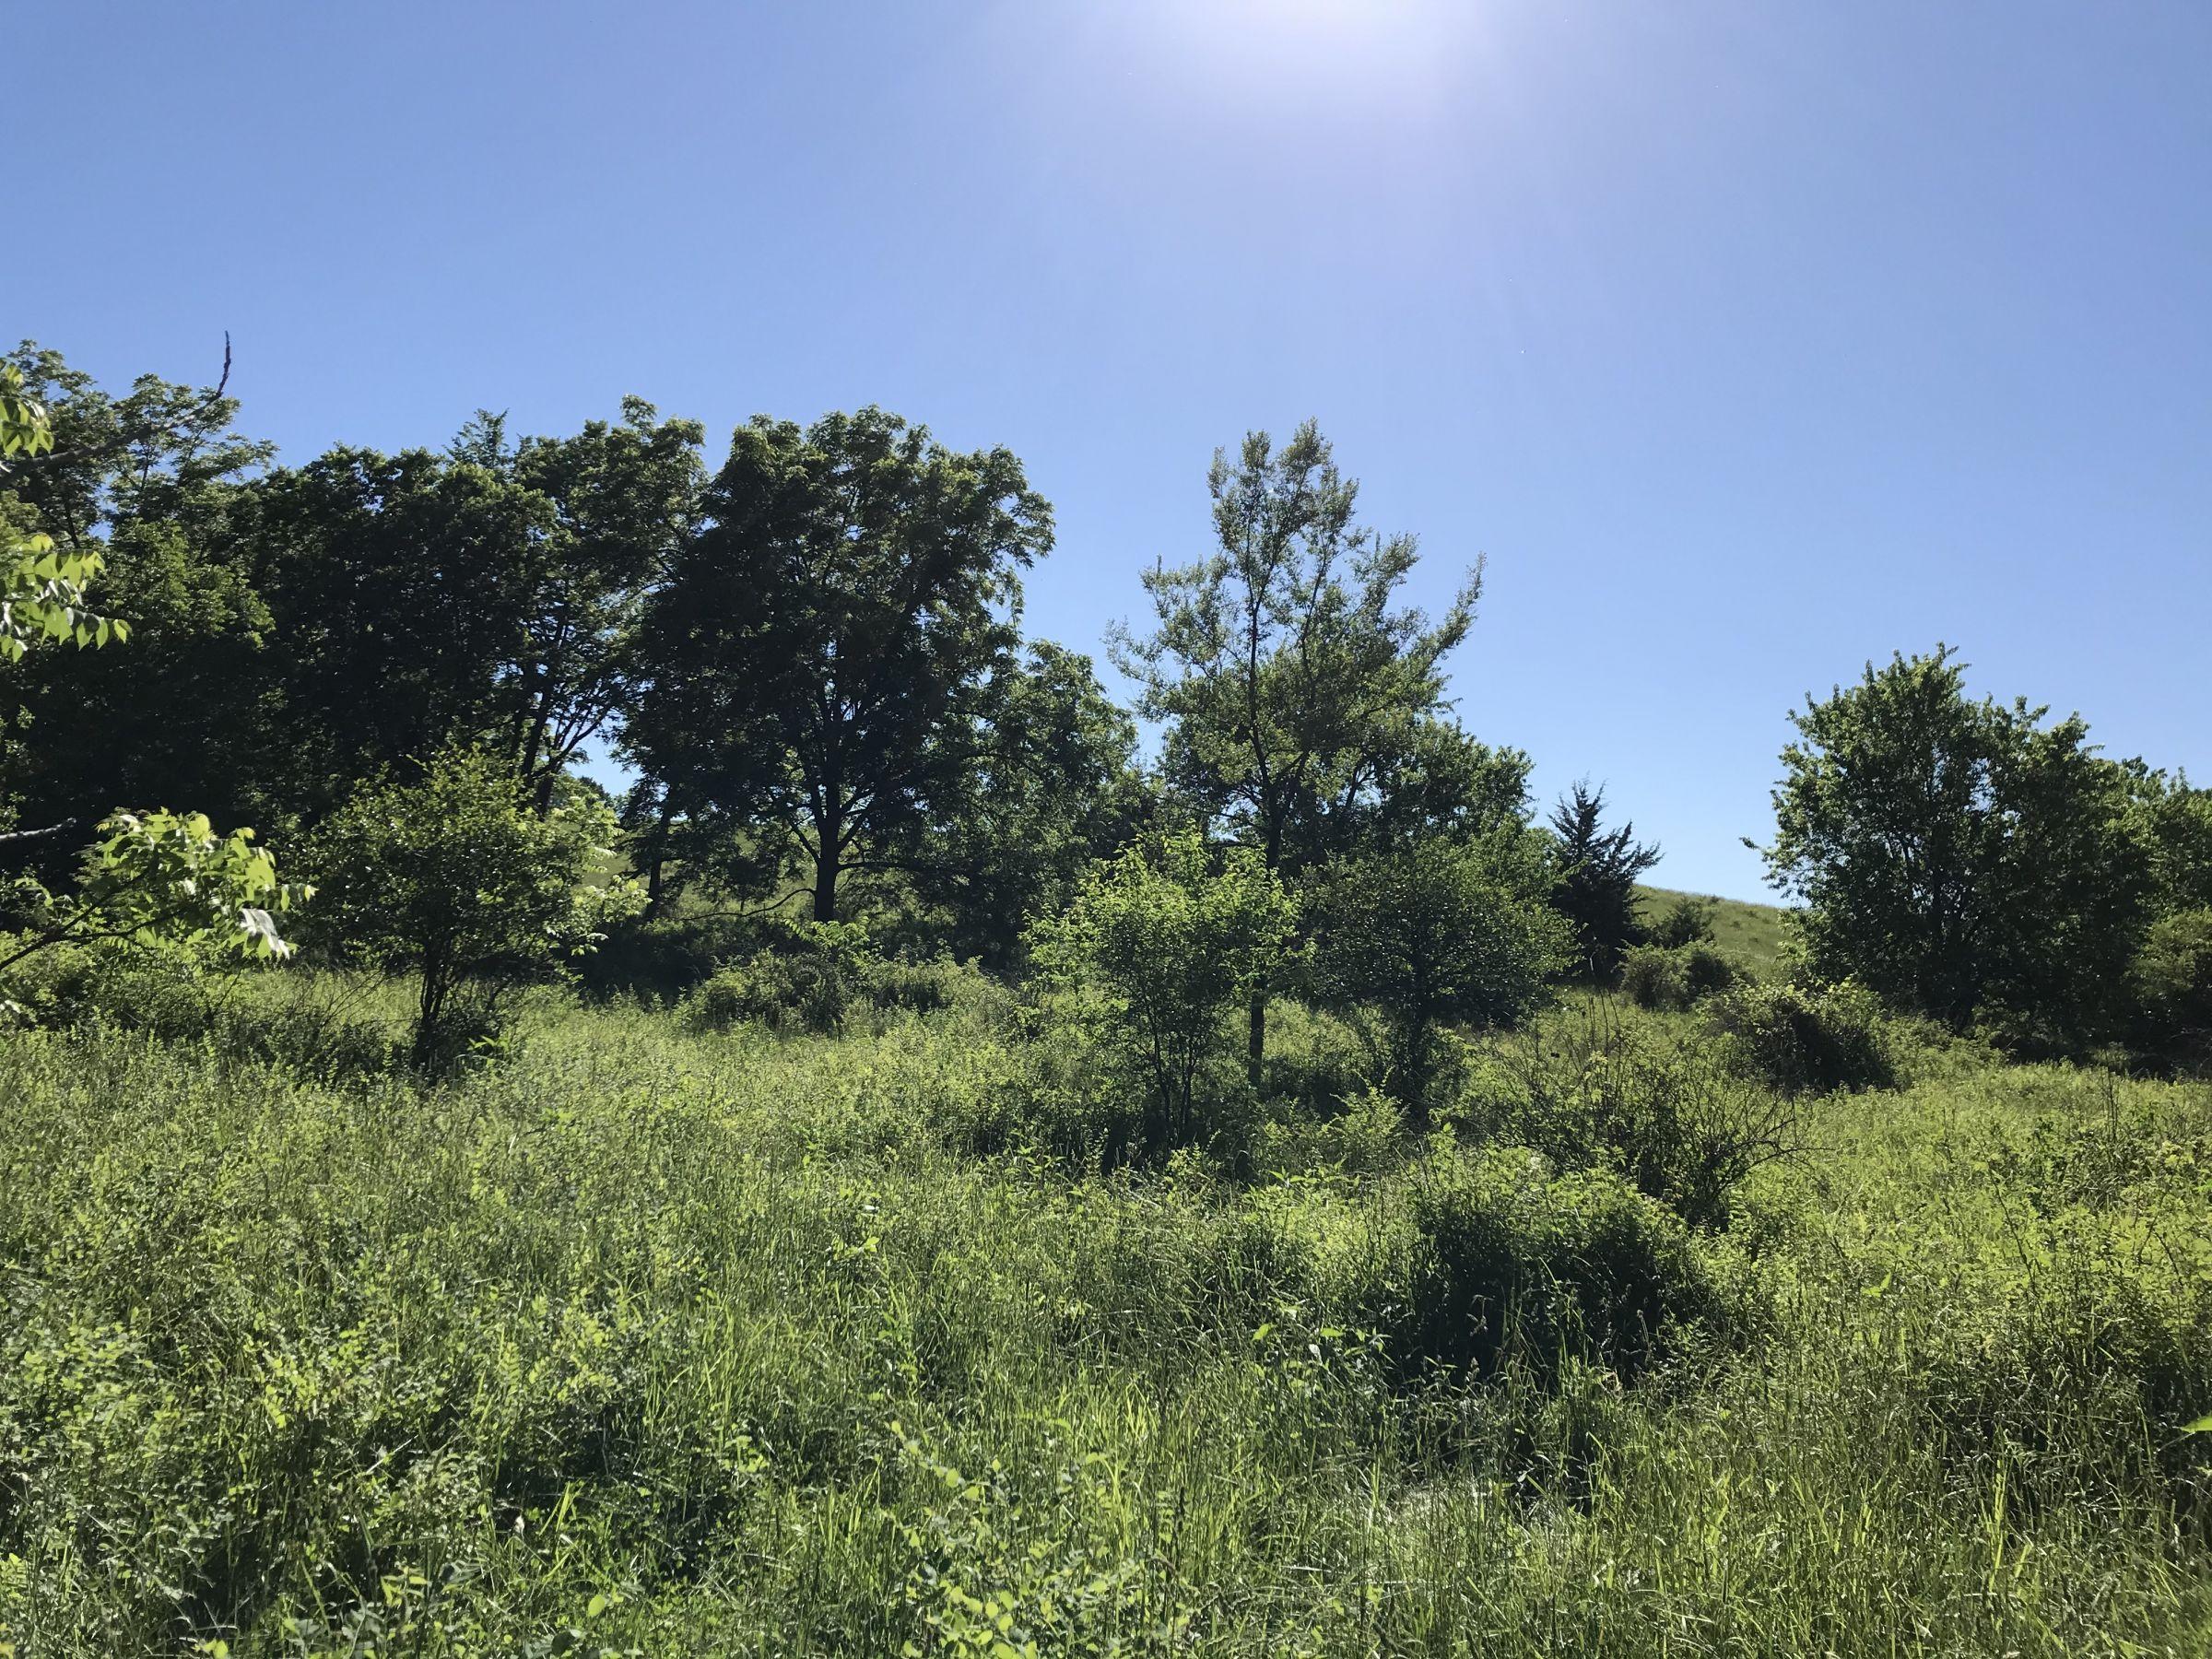 land-warren-county-iowa-60-acres-listing-number-15033-2-2020-06-14-151753.JPG